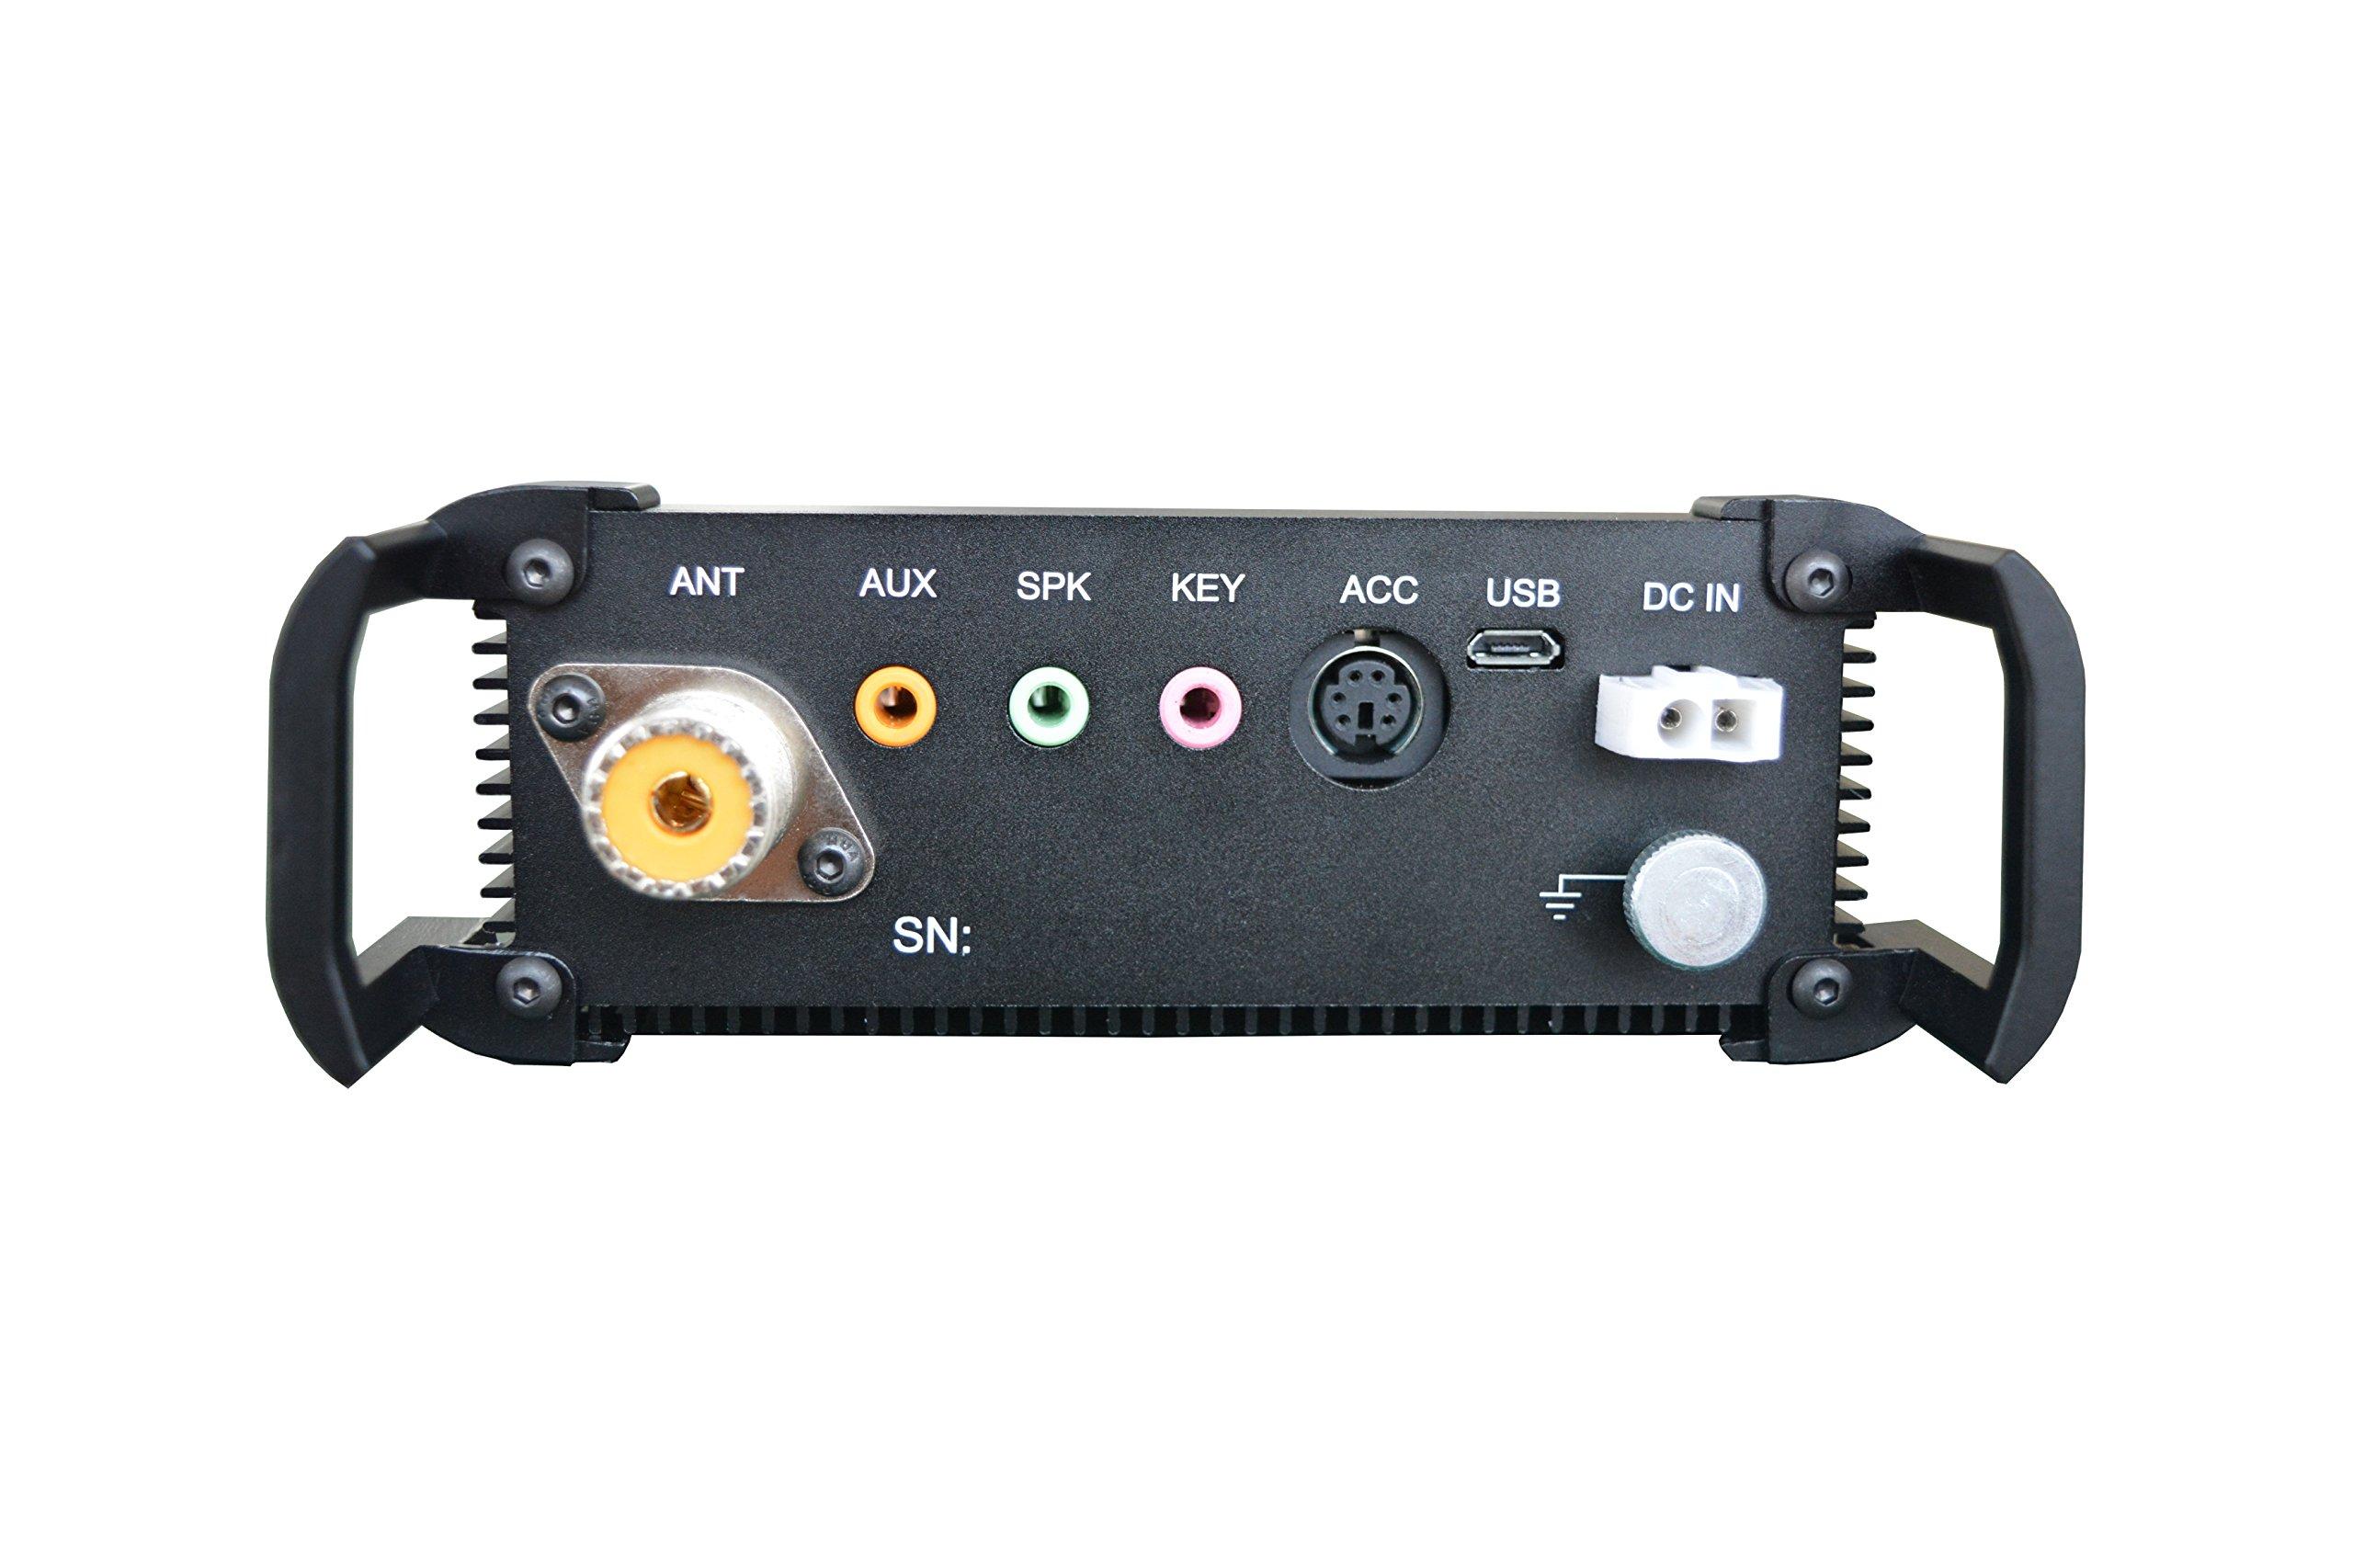 Xiegu X-108G QRP Transceiver Outdoor Version 9 Bands AM/SSB/CW 1-20 watts Black by Xiegu (Image #6)